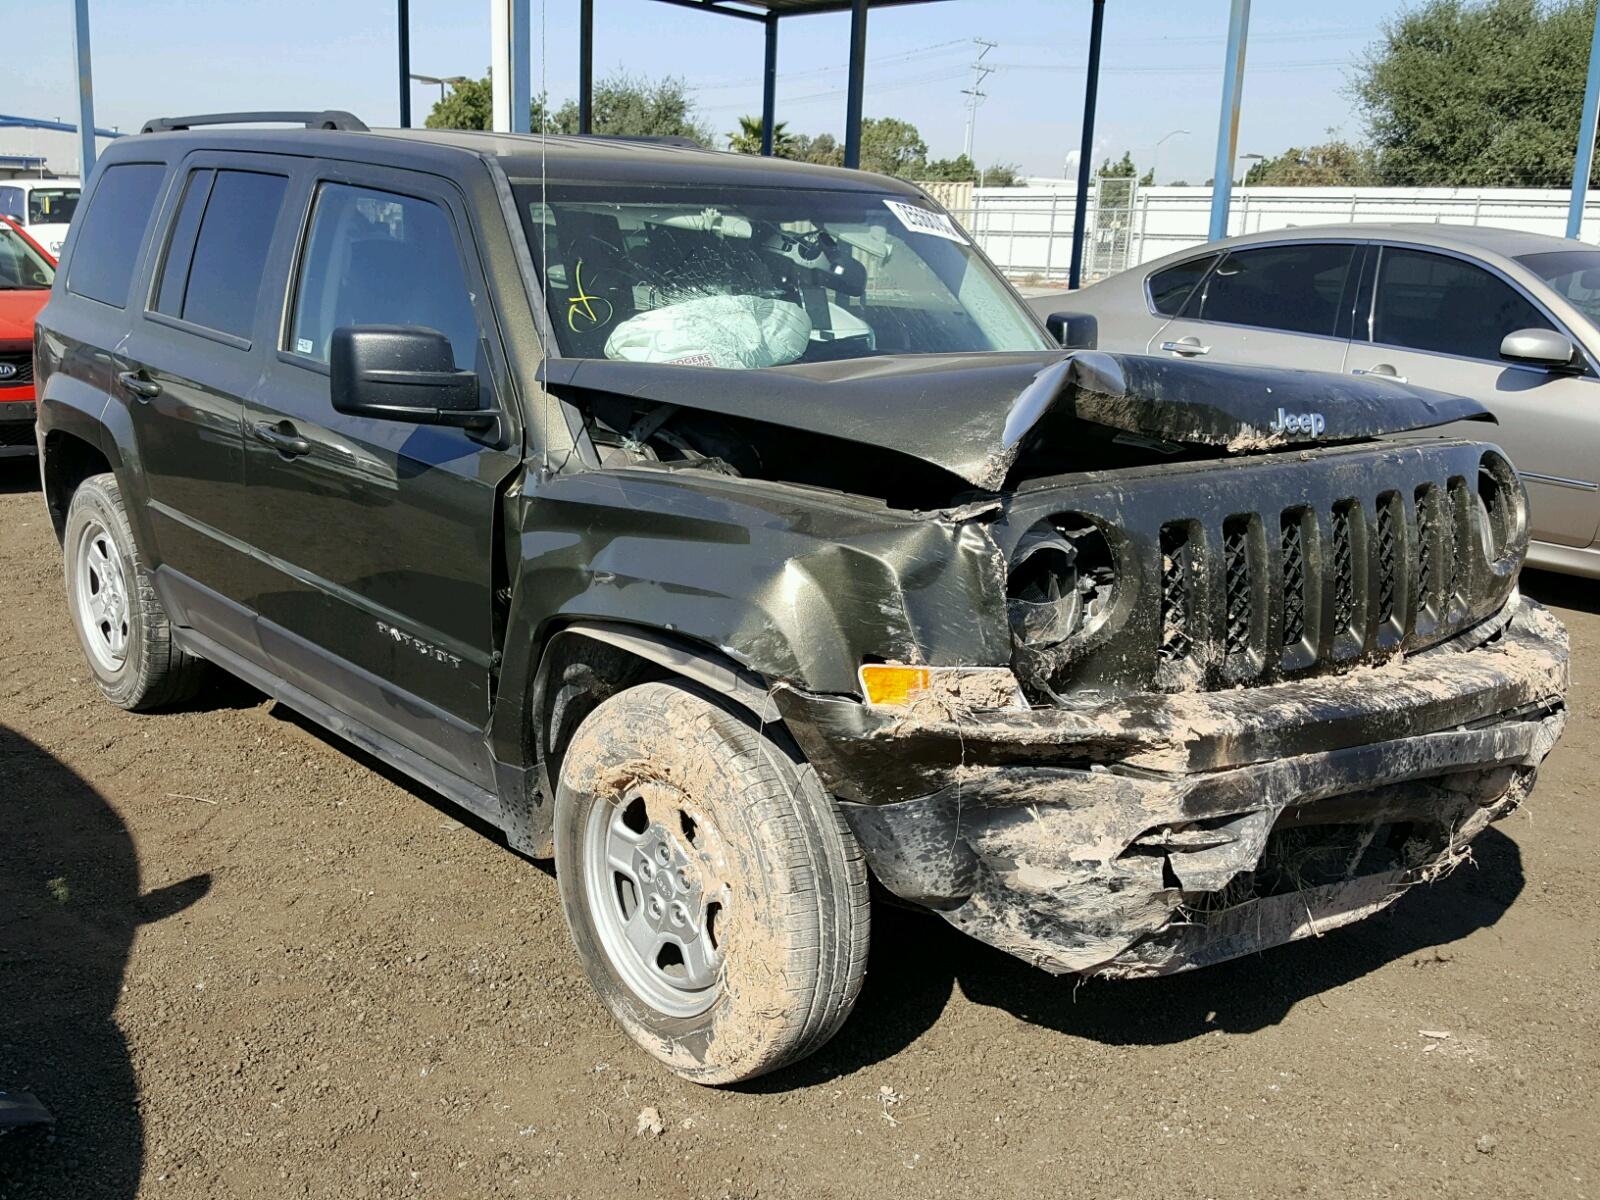 bump and birthday california car trip diego surprise rental the jeep trav vacation san beauty wrangler family